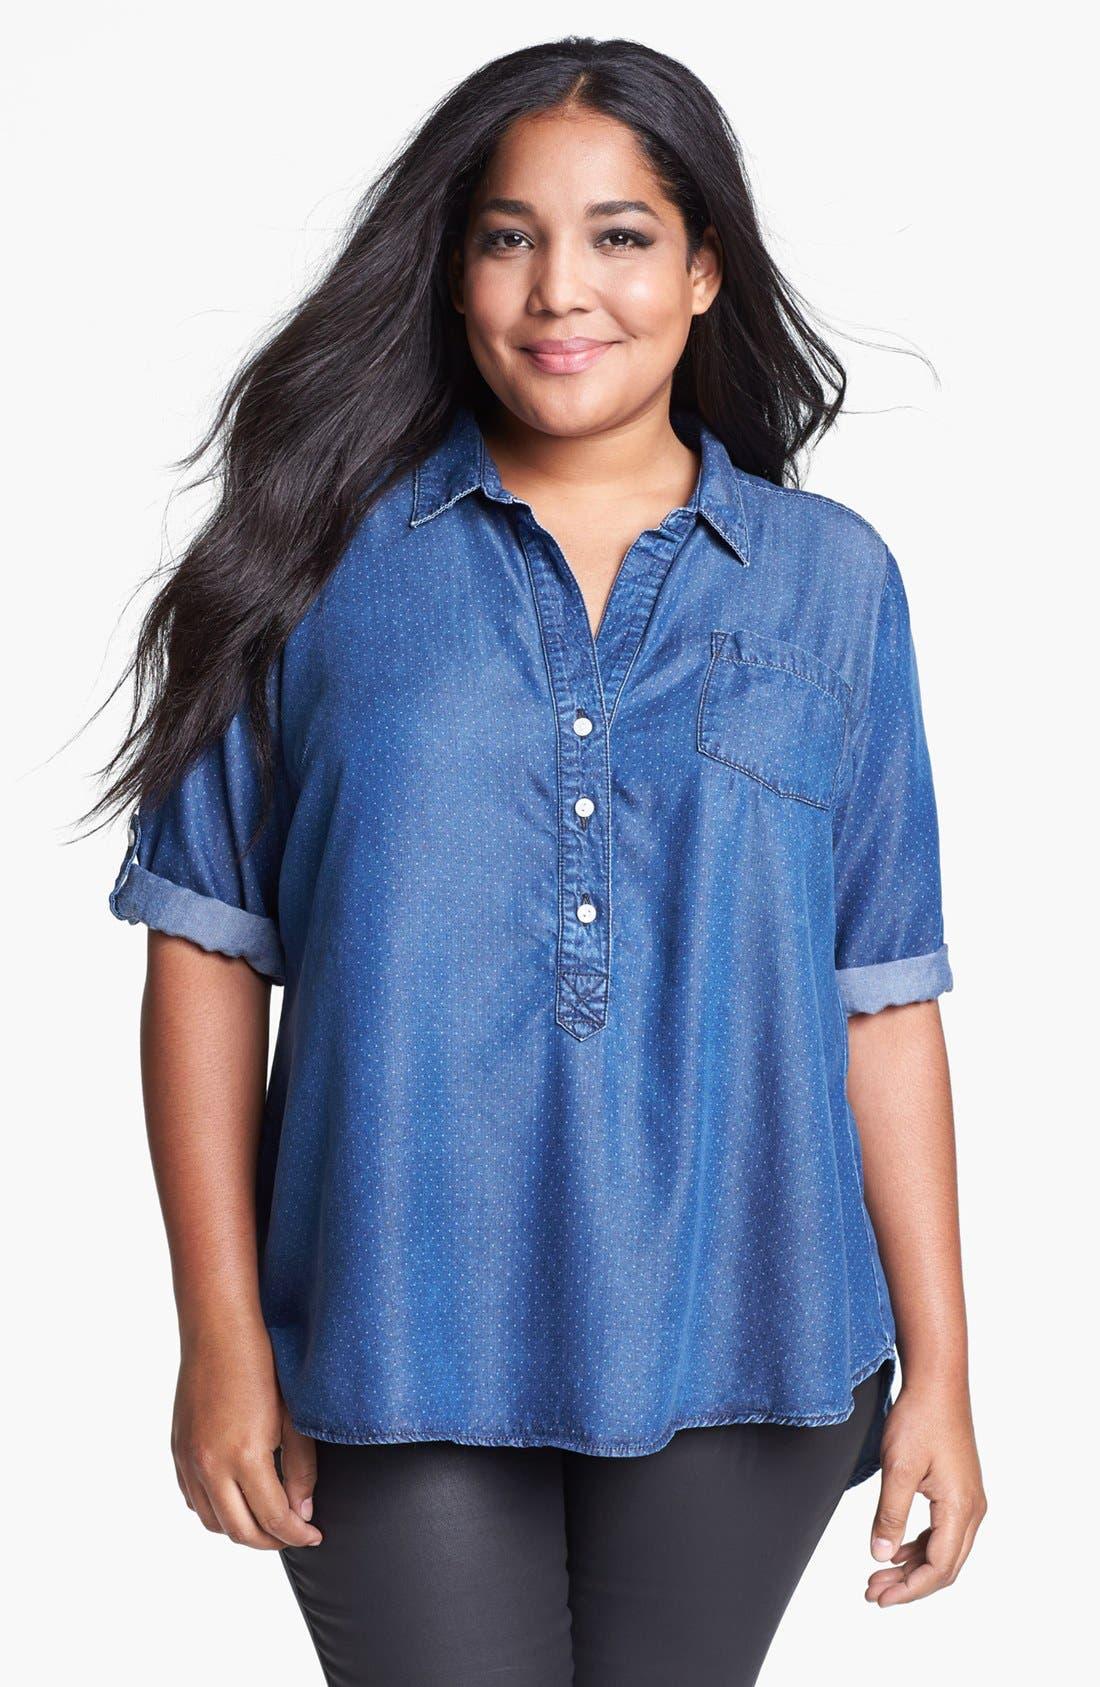 Alternate Image 1 Selected - Lucky Brand 'Charleigh' Polka Dot Chambray Shirt (Plus Size)